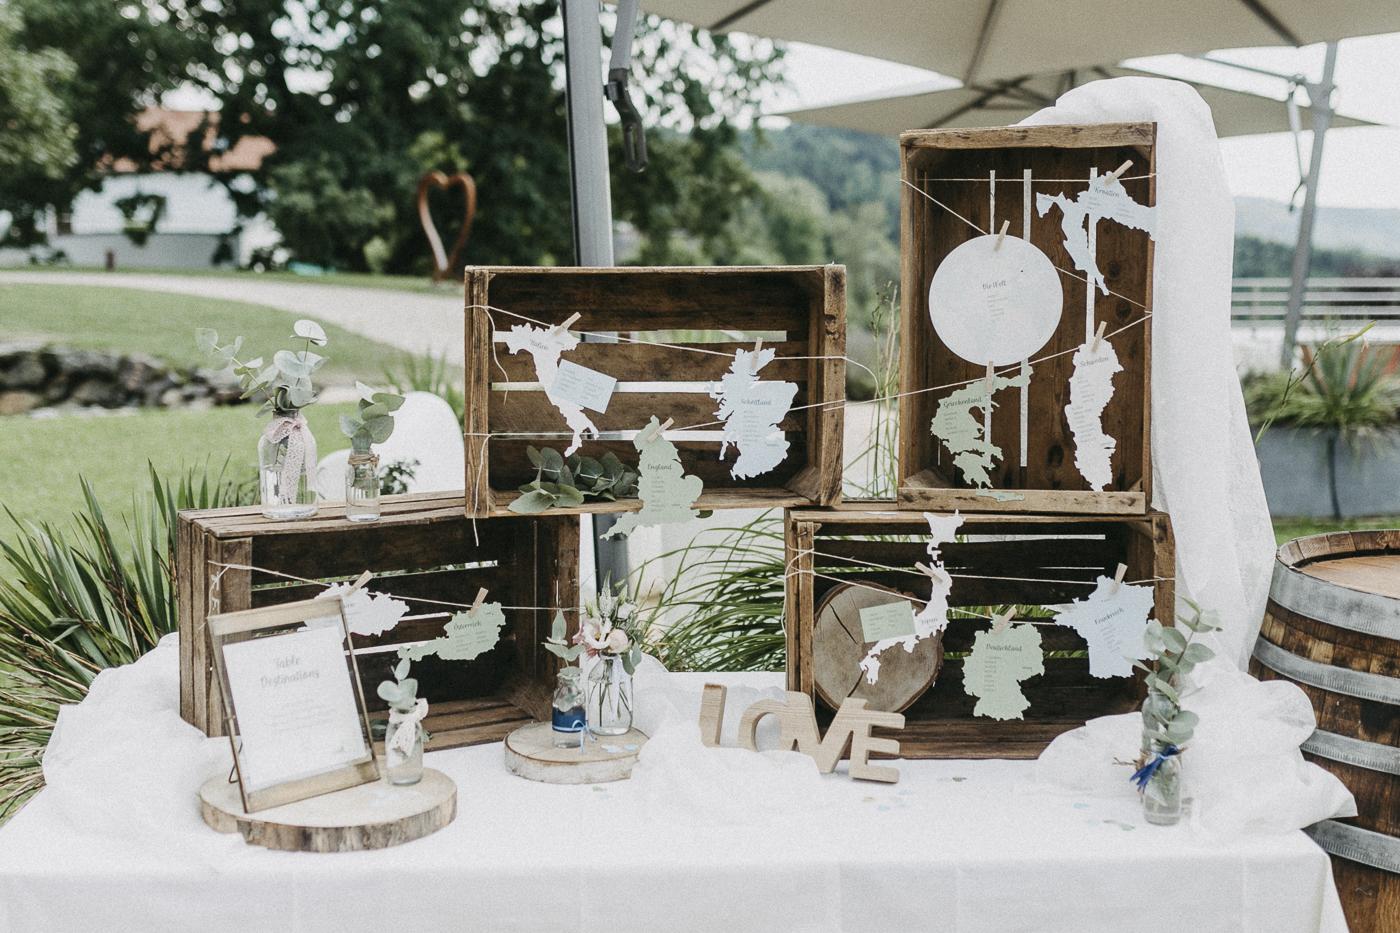 rosemarrylemon_ND_Hochzeit_Tischplan.jpg